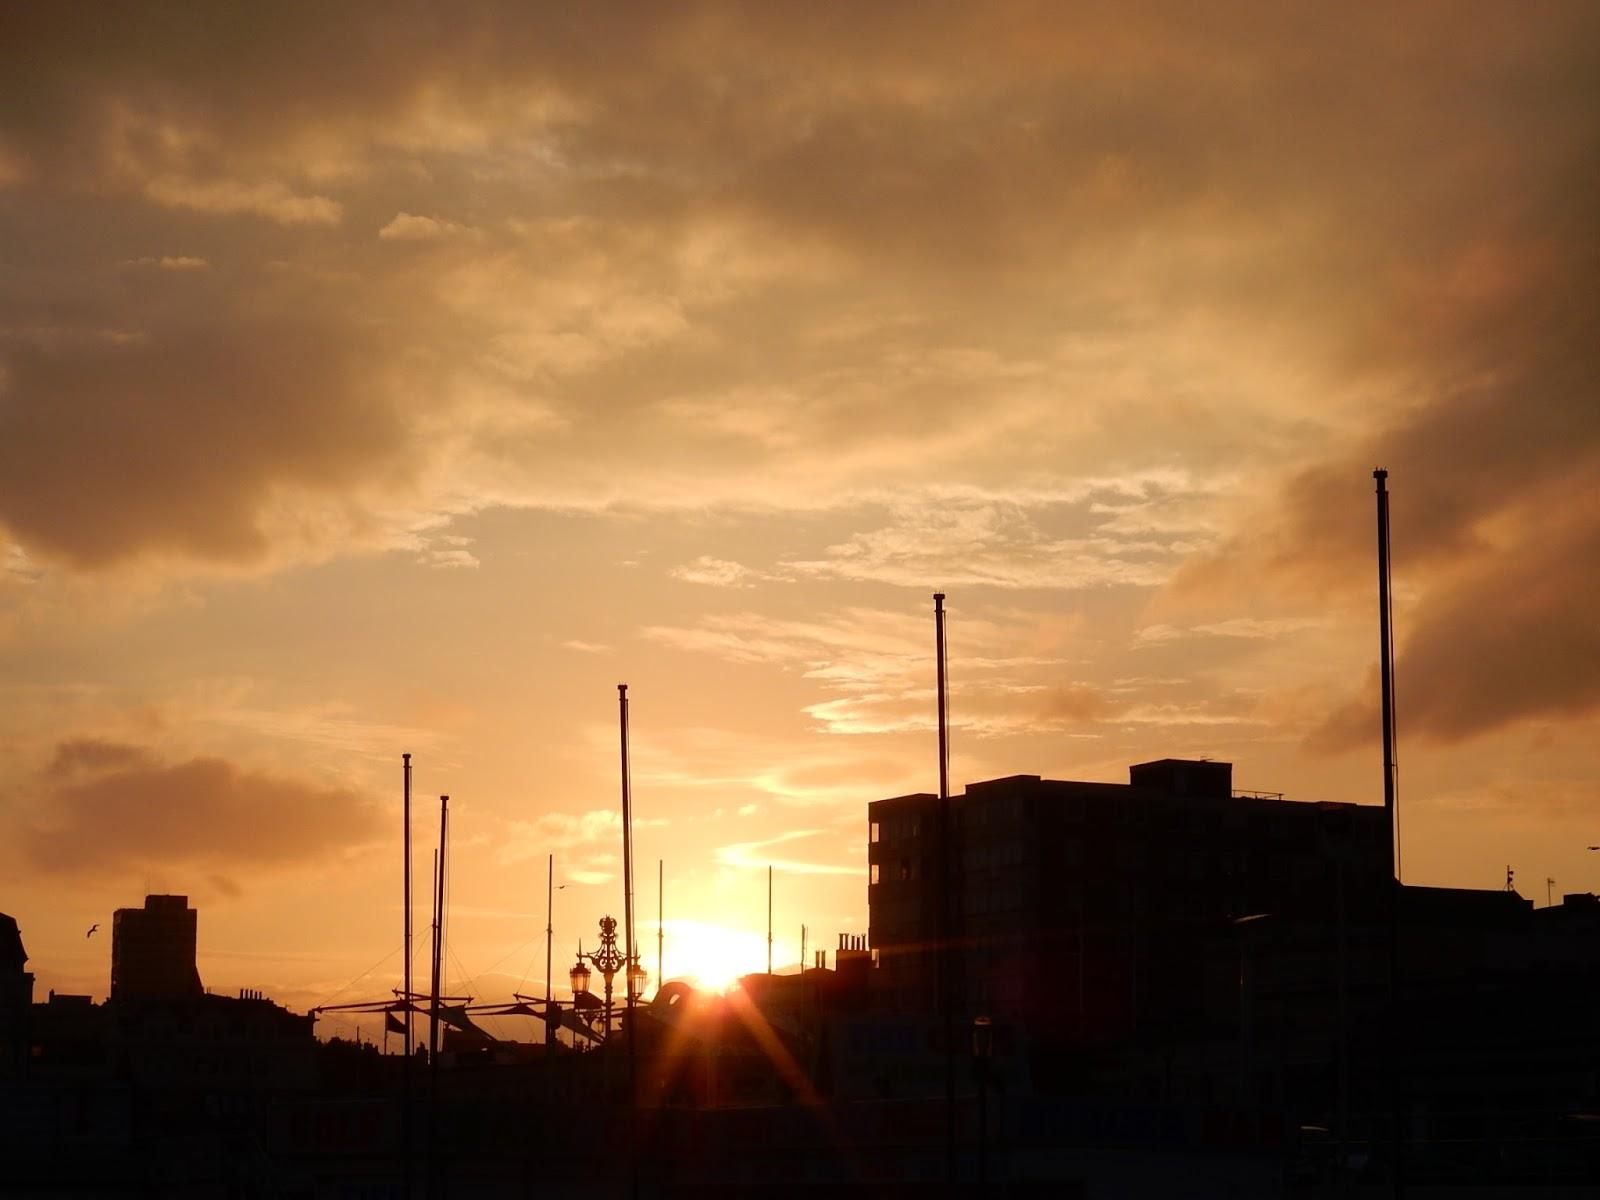 Brighton Beach Sunset Life Lately Adventures of a London Kiwi